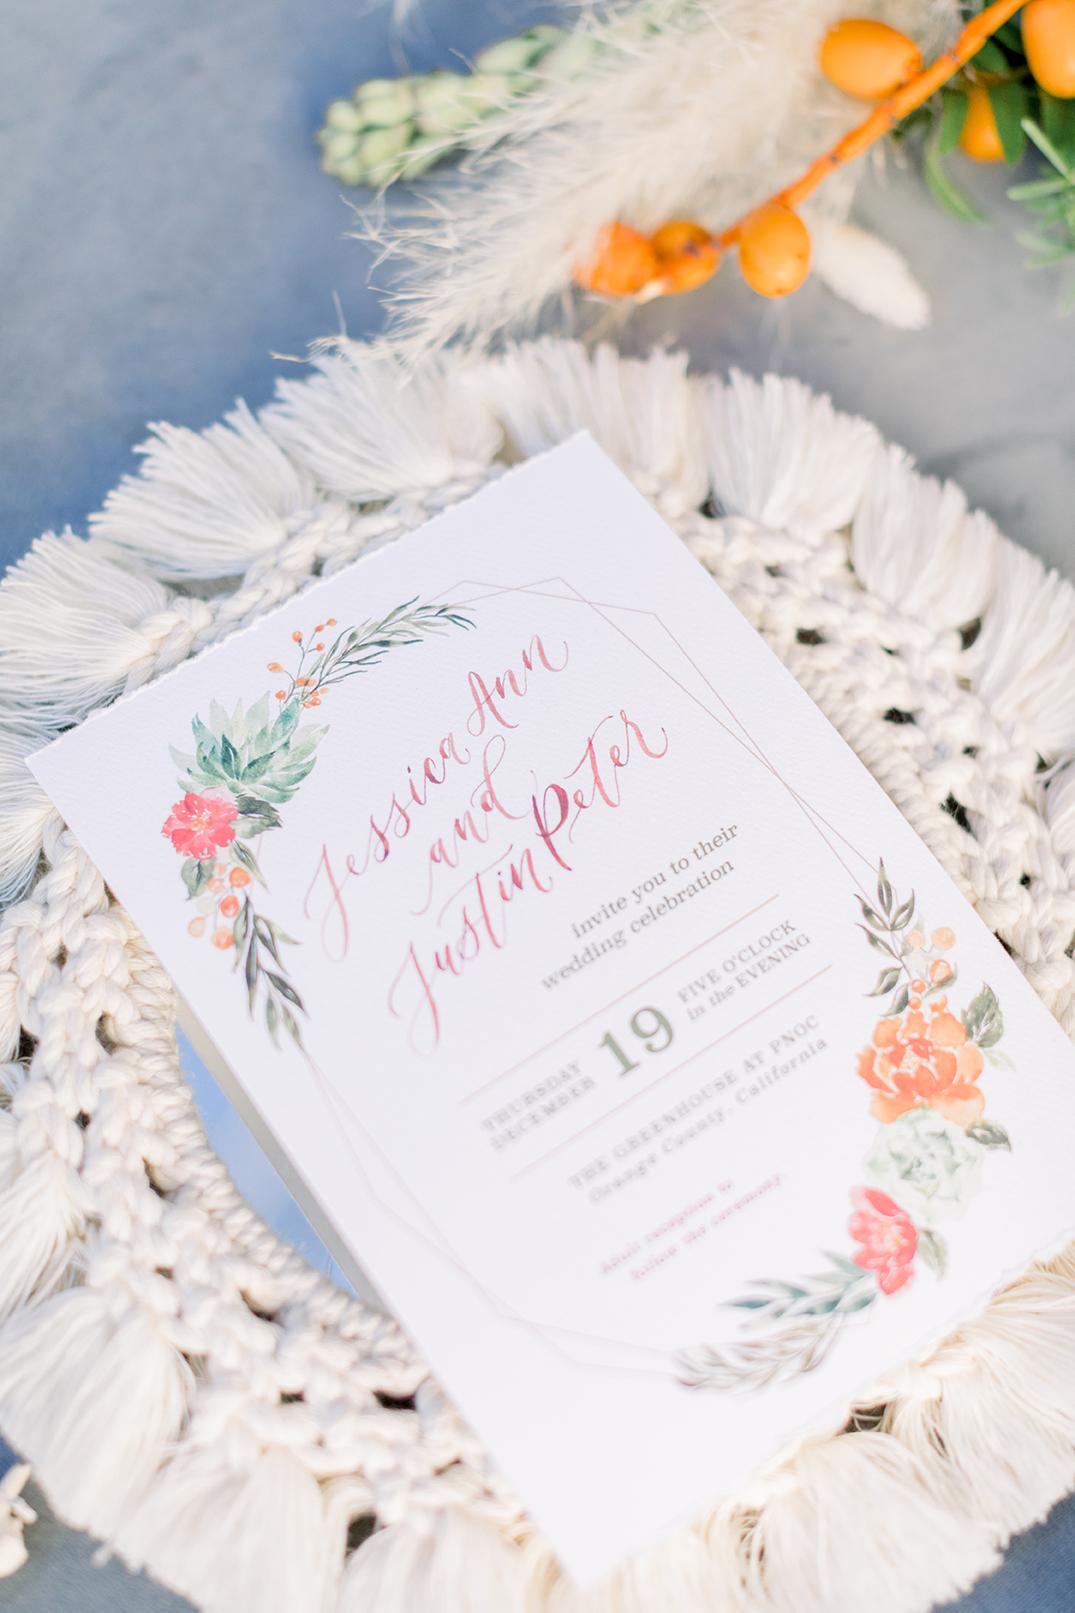 SWP-TheGreenhouse Boho Wedding Inspiration-Sam Allen Creates Wedding Invitation with Succulents Detail